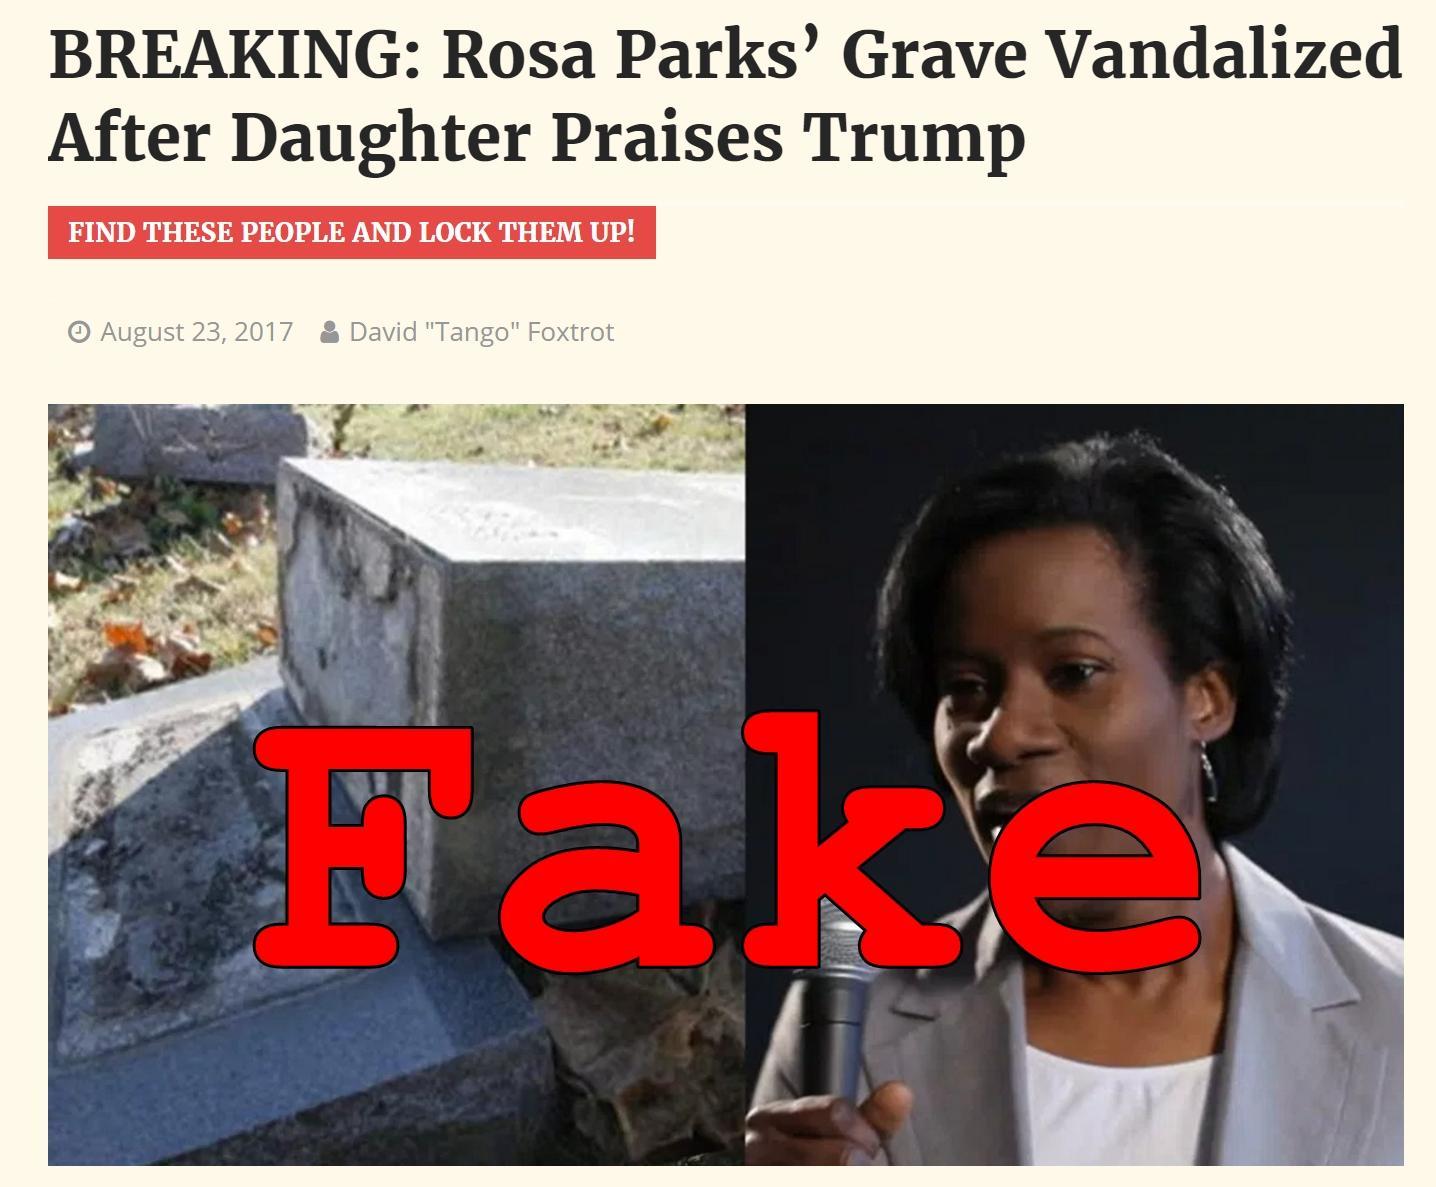 Fake News: Rosa Parks' Grave NOT Vandalized After Daughter Praises Trump